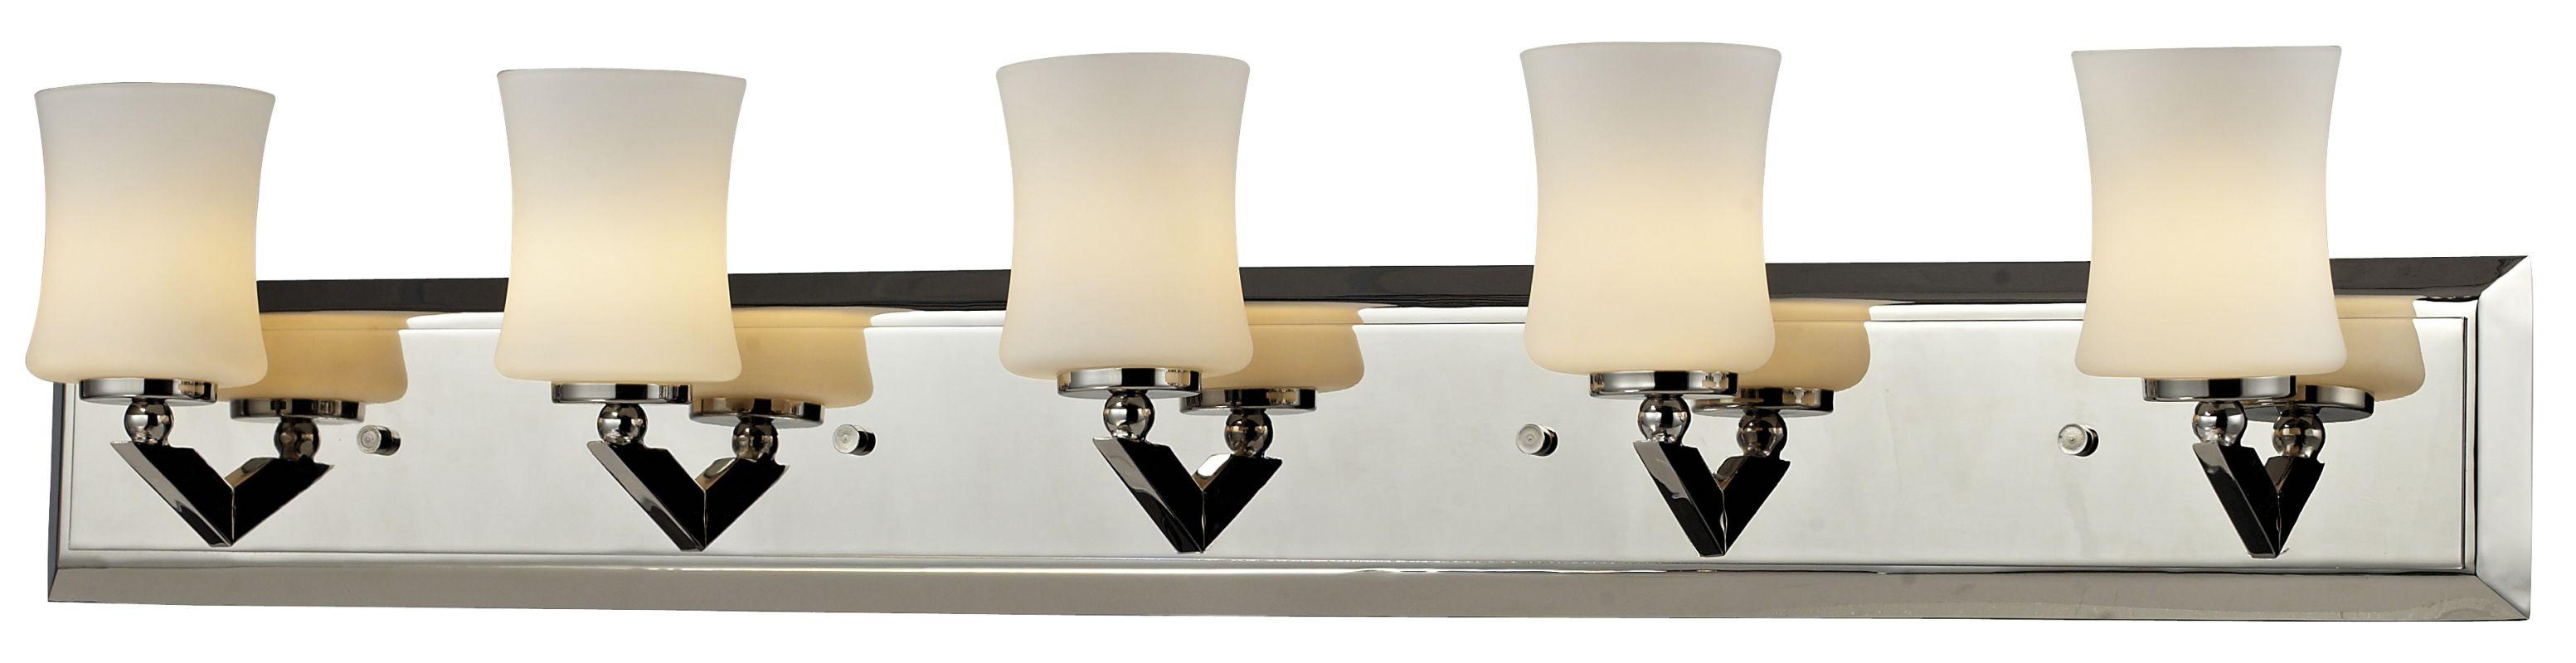 Z-Lite 608-5V Elite 5 Light Bathroom Vanity Light with Matte Opal